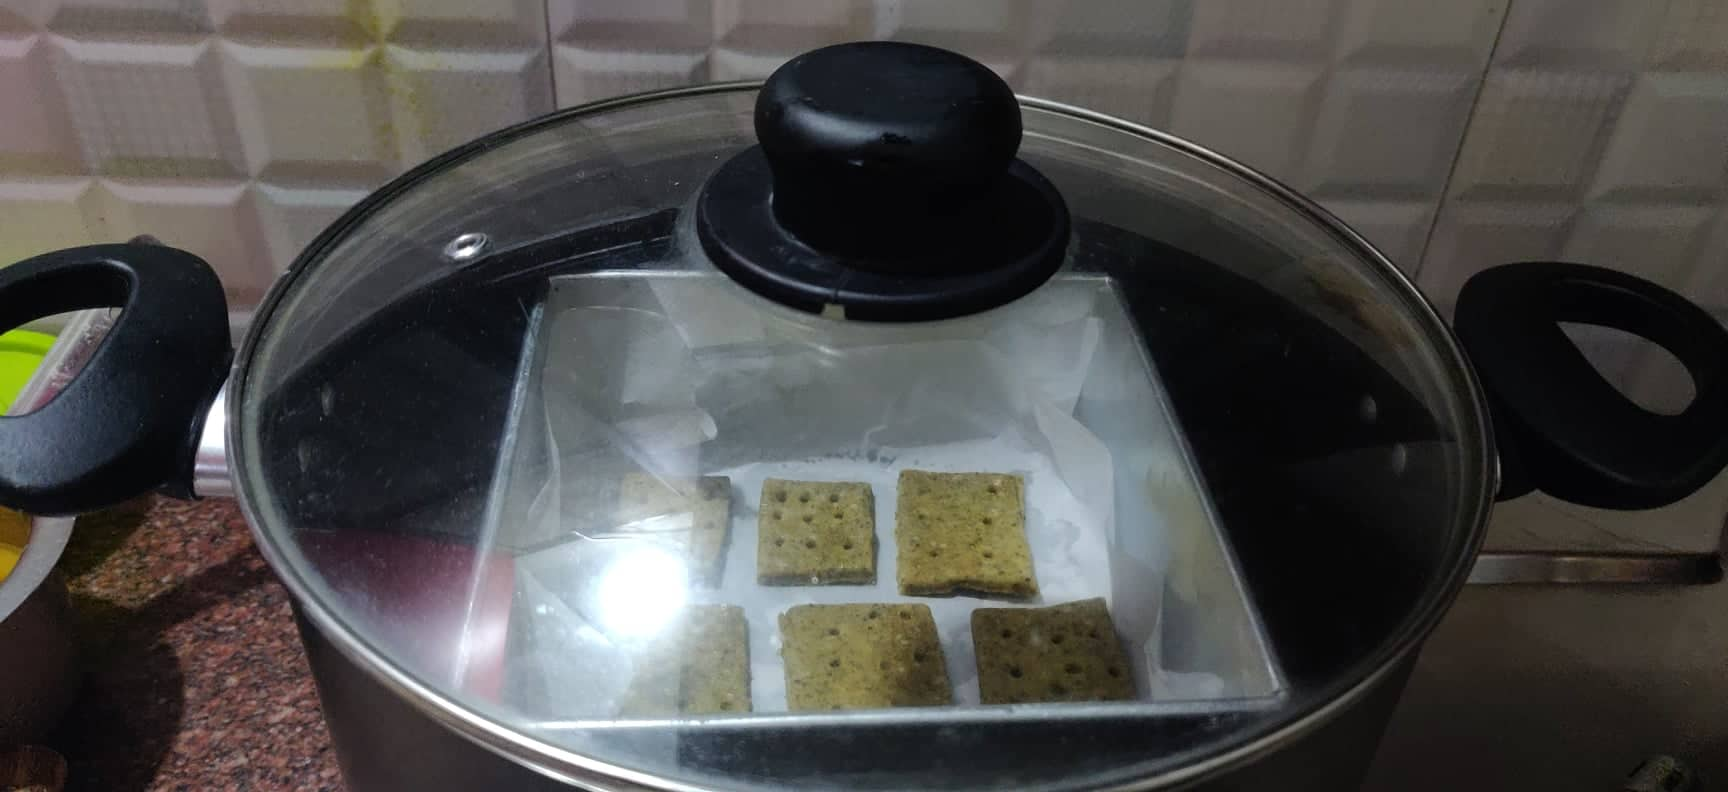 curry_leaves_crackers - 70602521_582653082479798_8733457564215279616_n